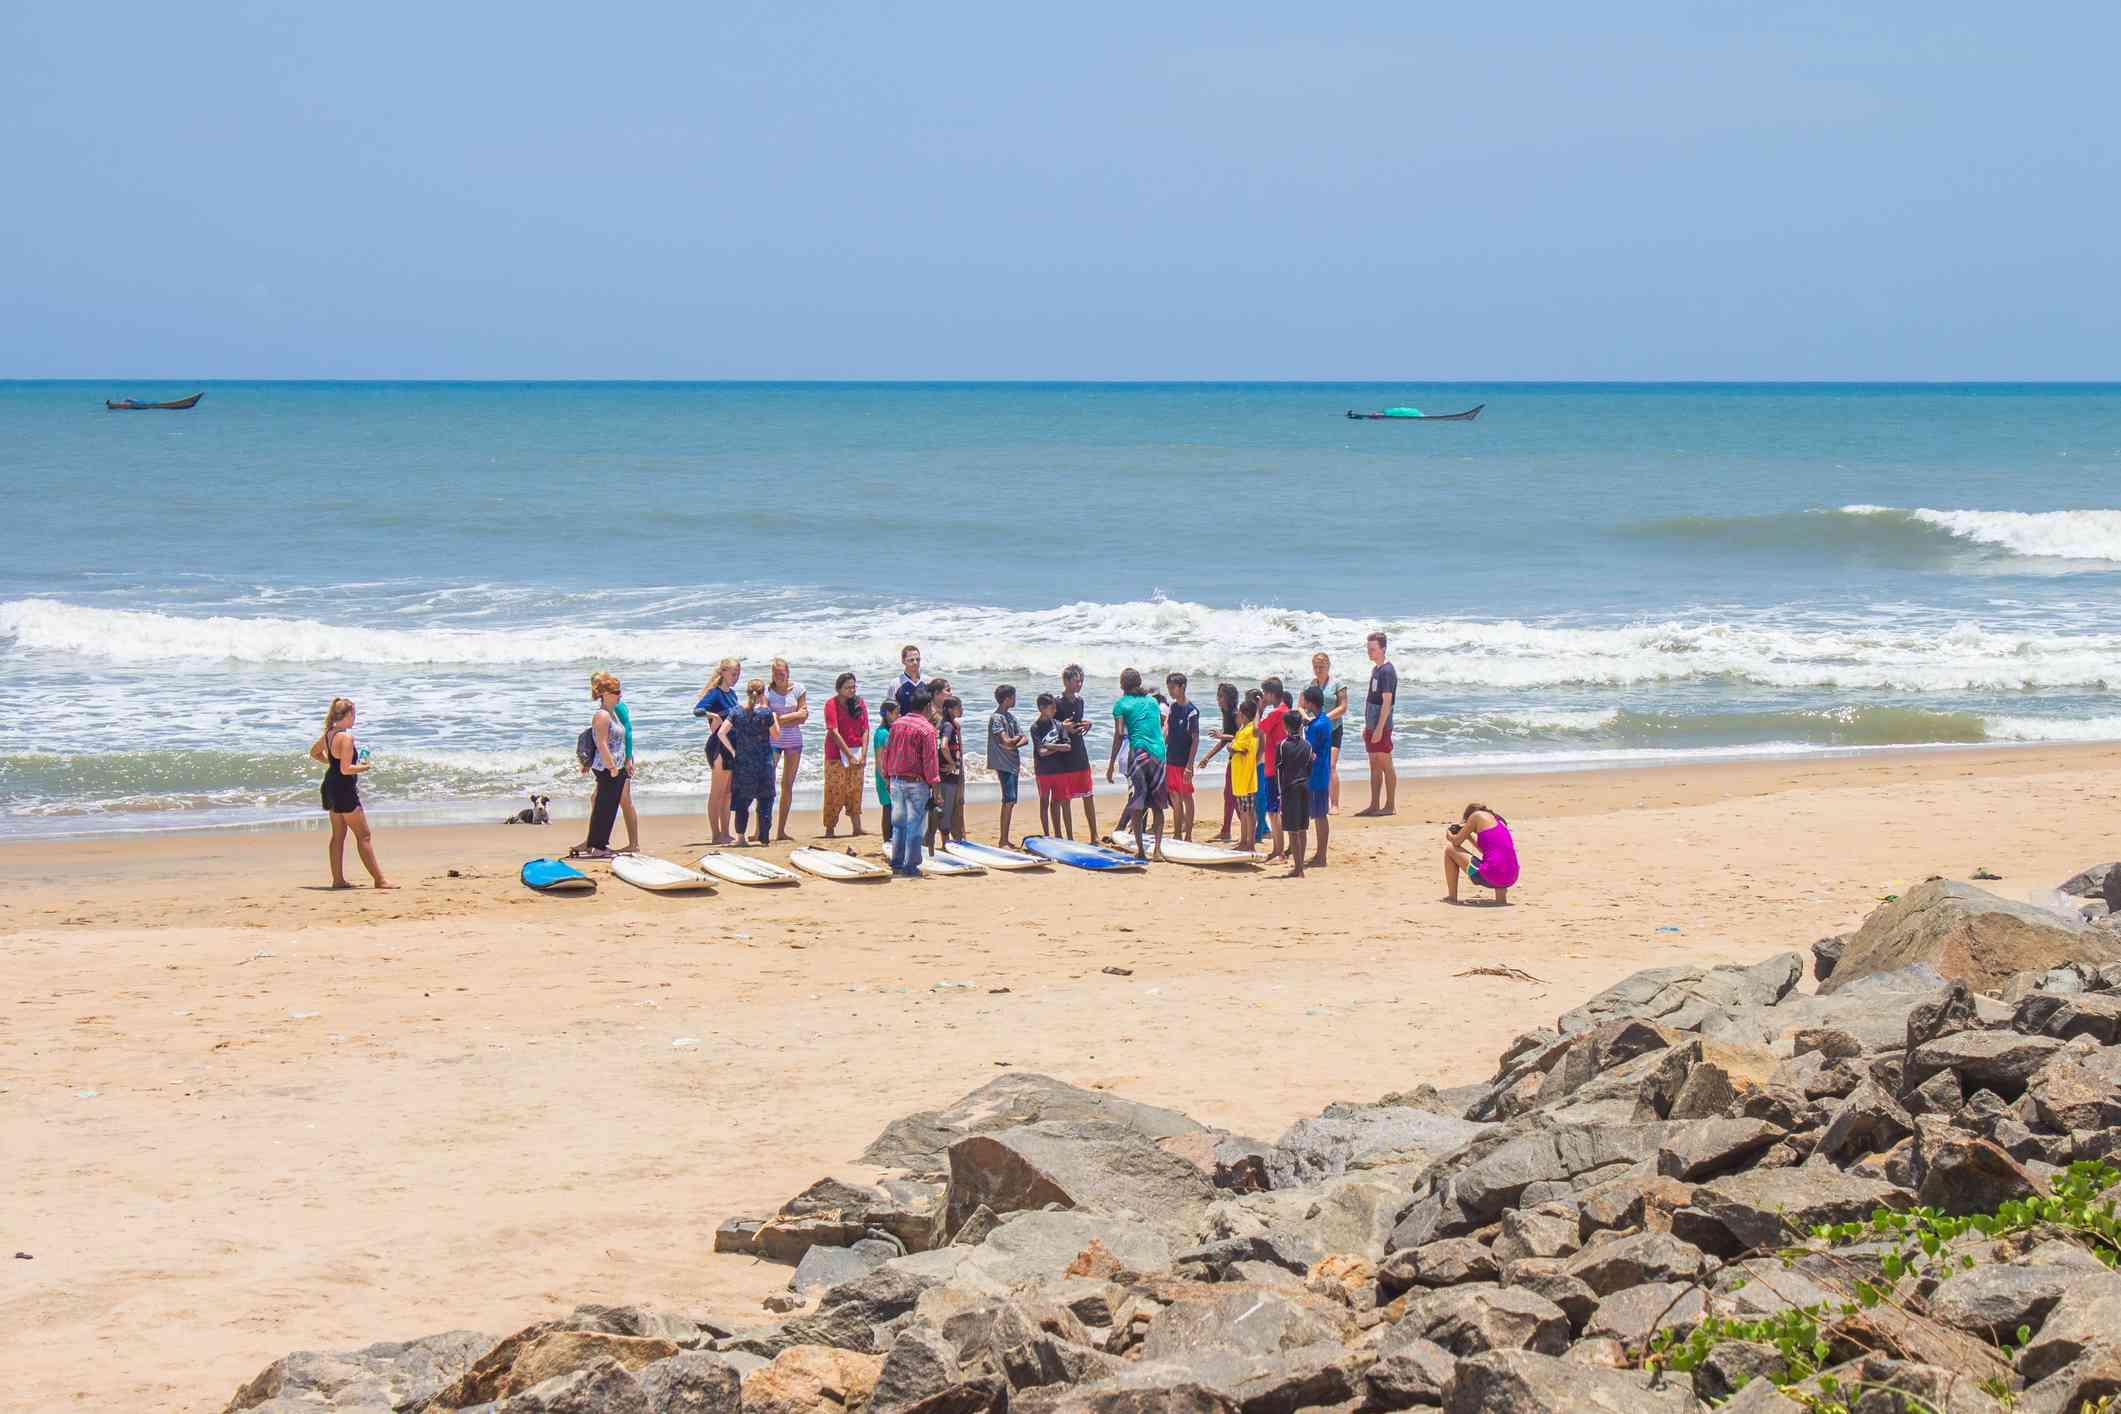 Tourists learn to surf on a beach at Mahabalipuram, Tamil Nadu